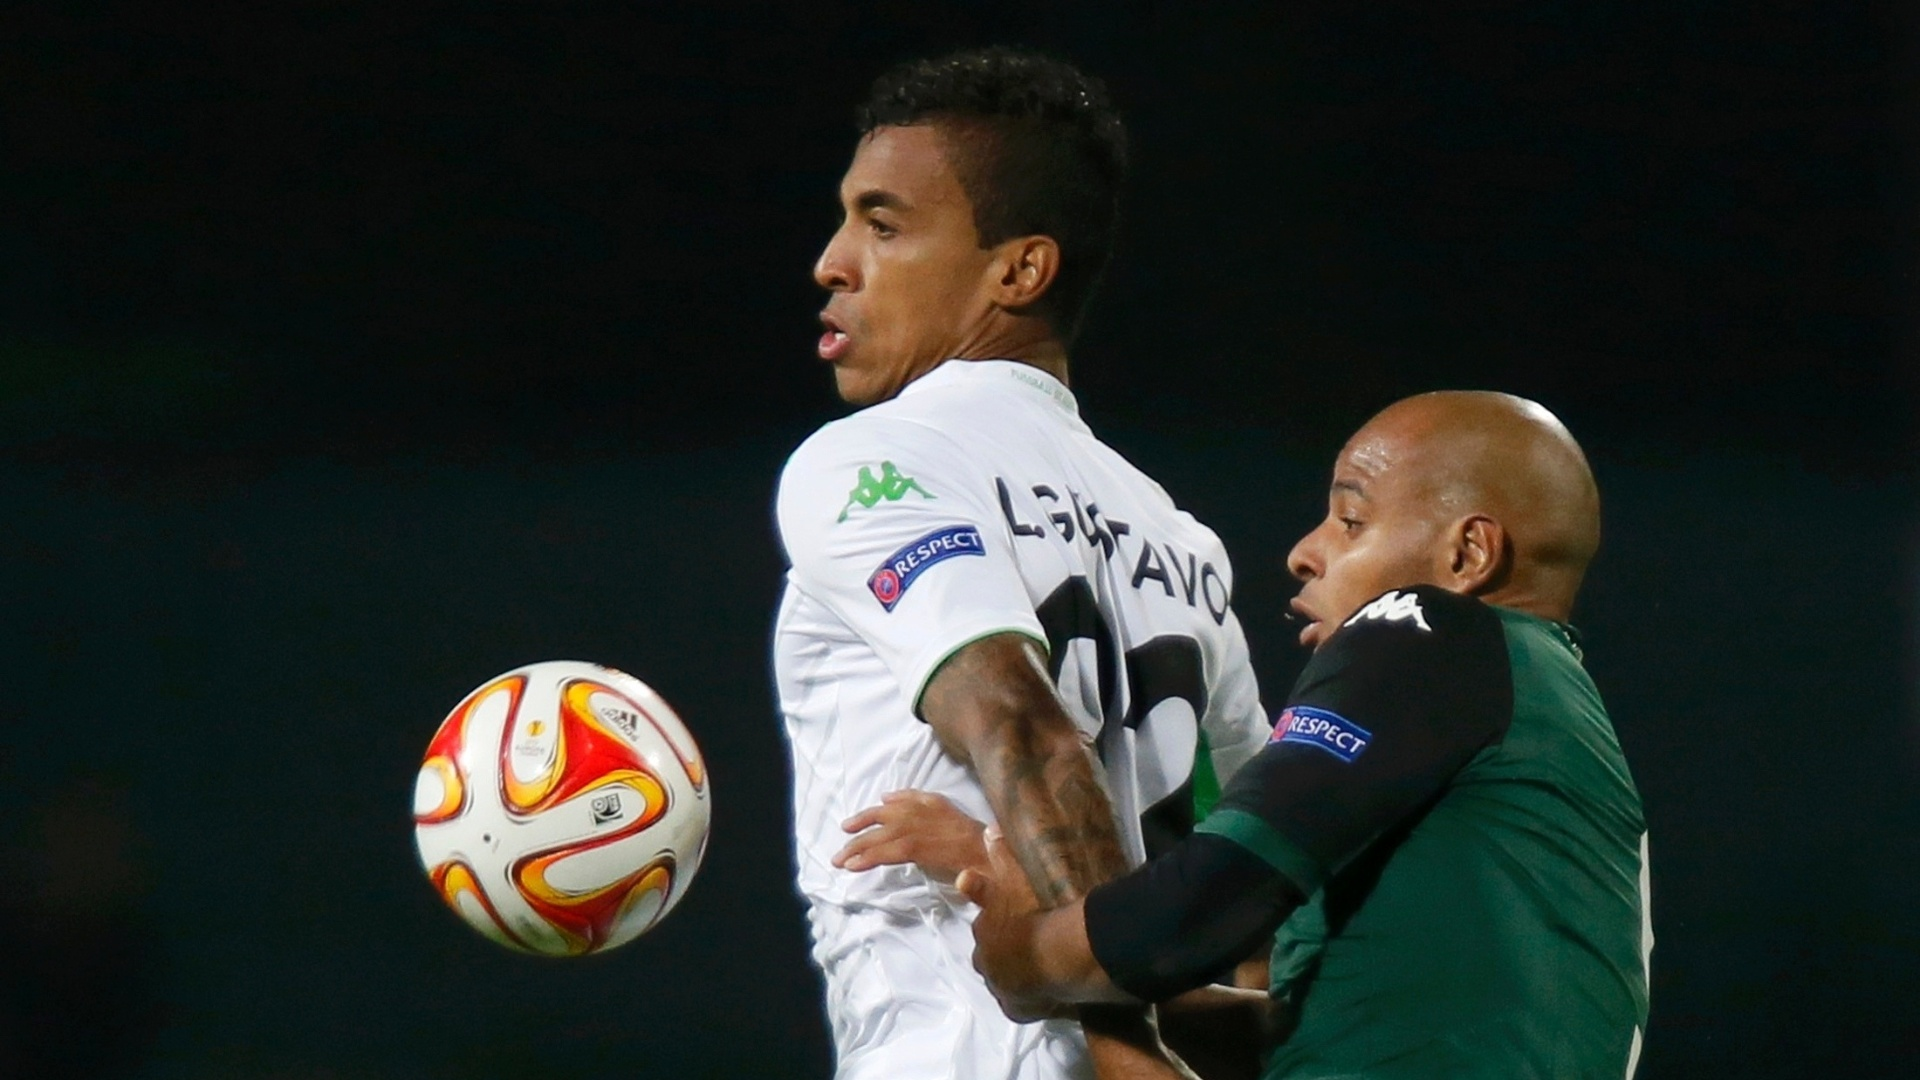 Luiz Gustavo (esquerda) e Ari (direita) disputam bola durante jogo entre Wolfsburg x Krasnodar